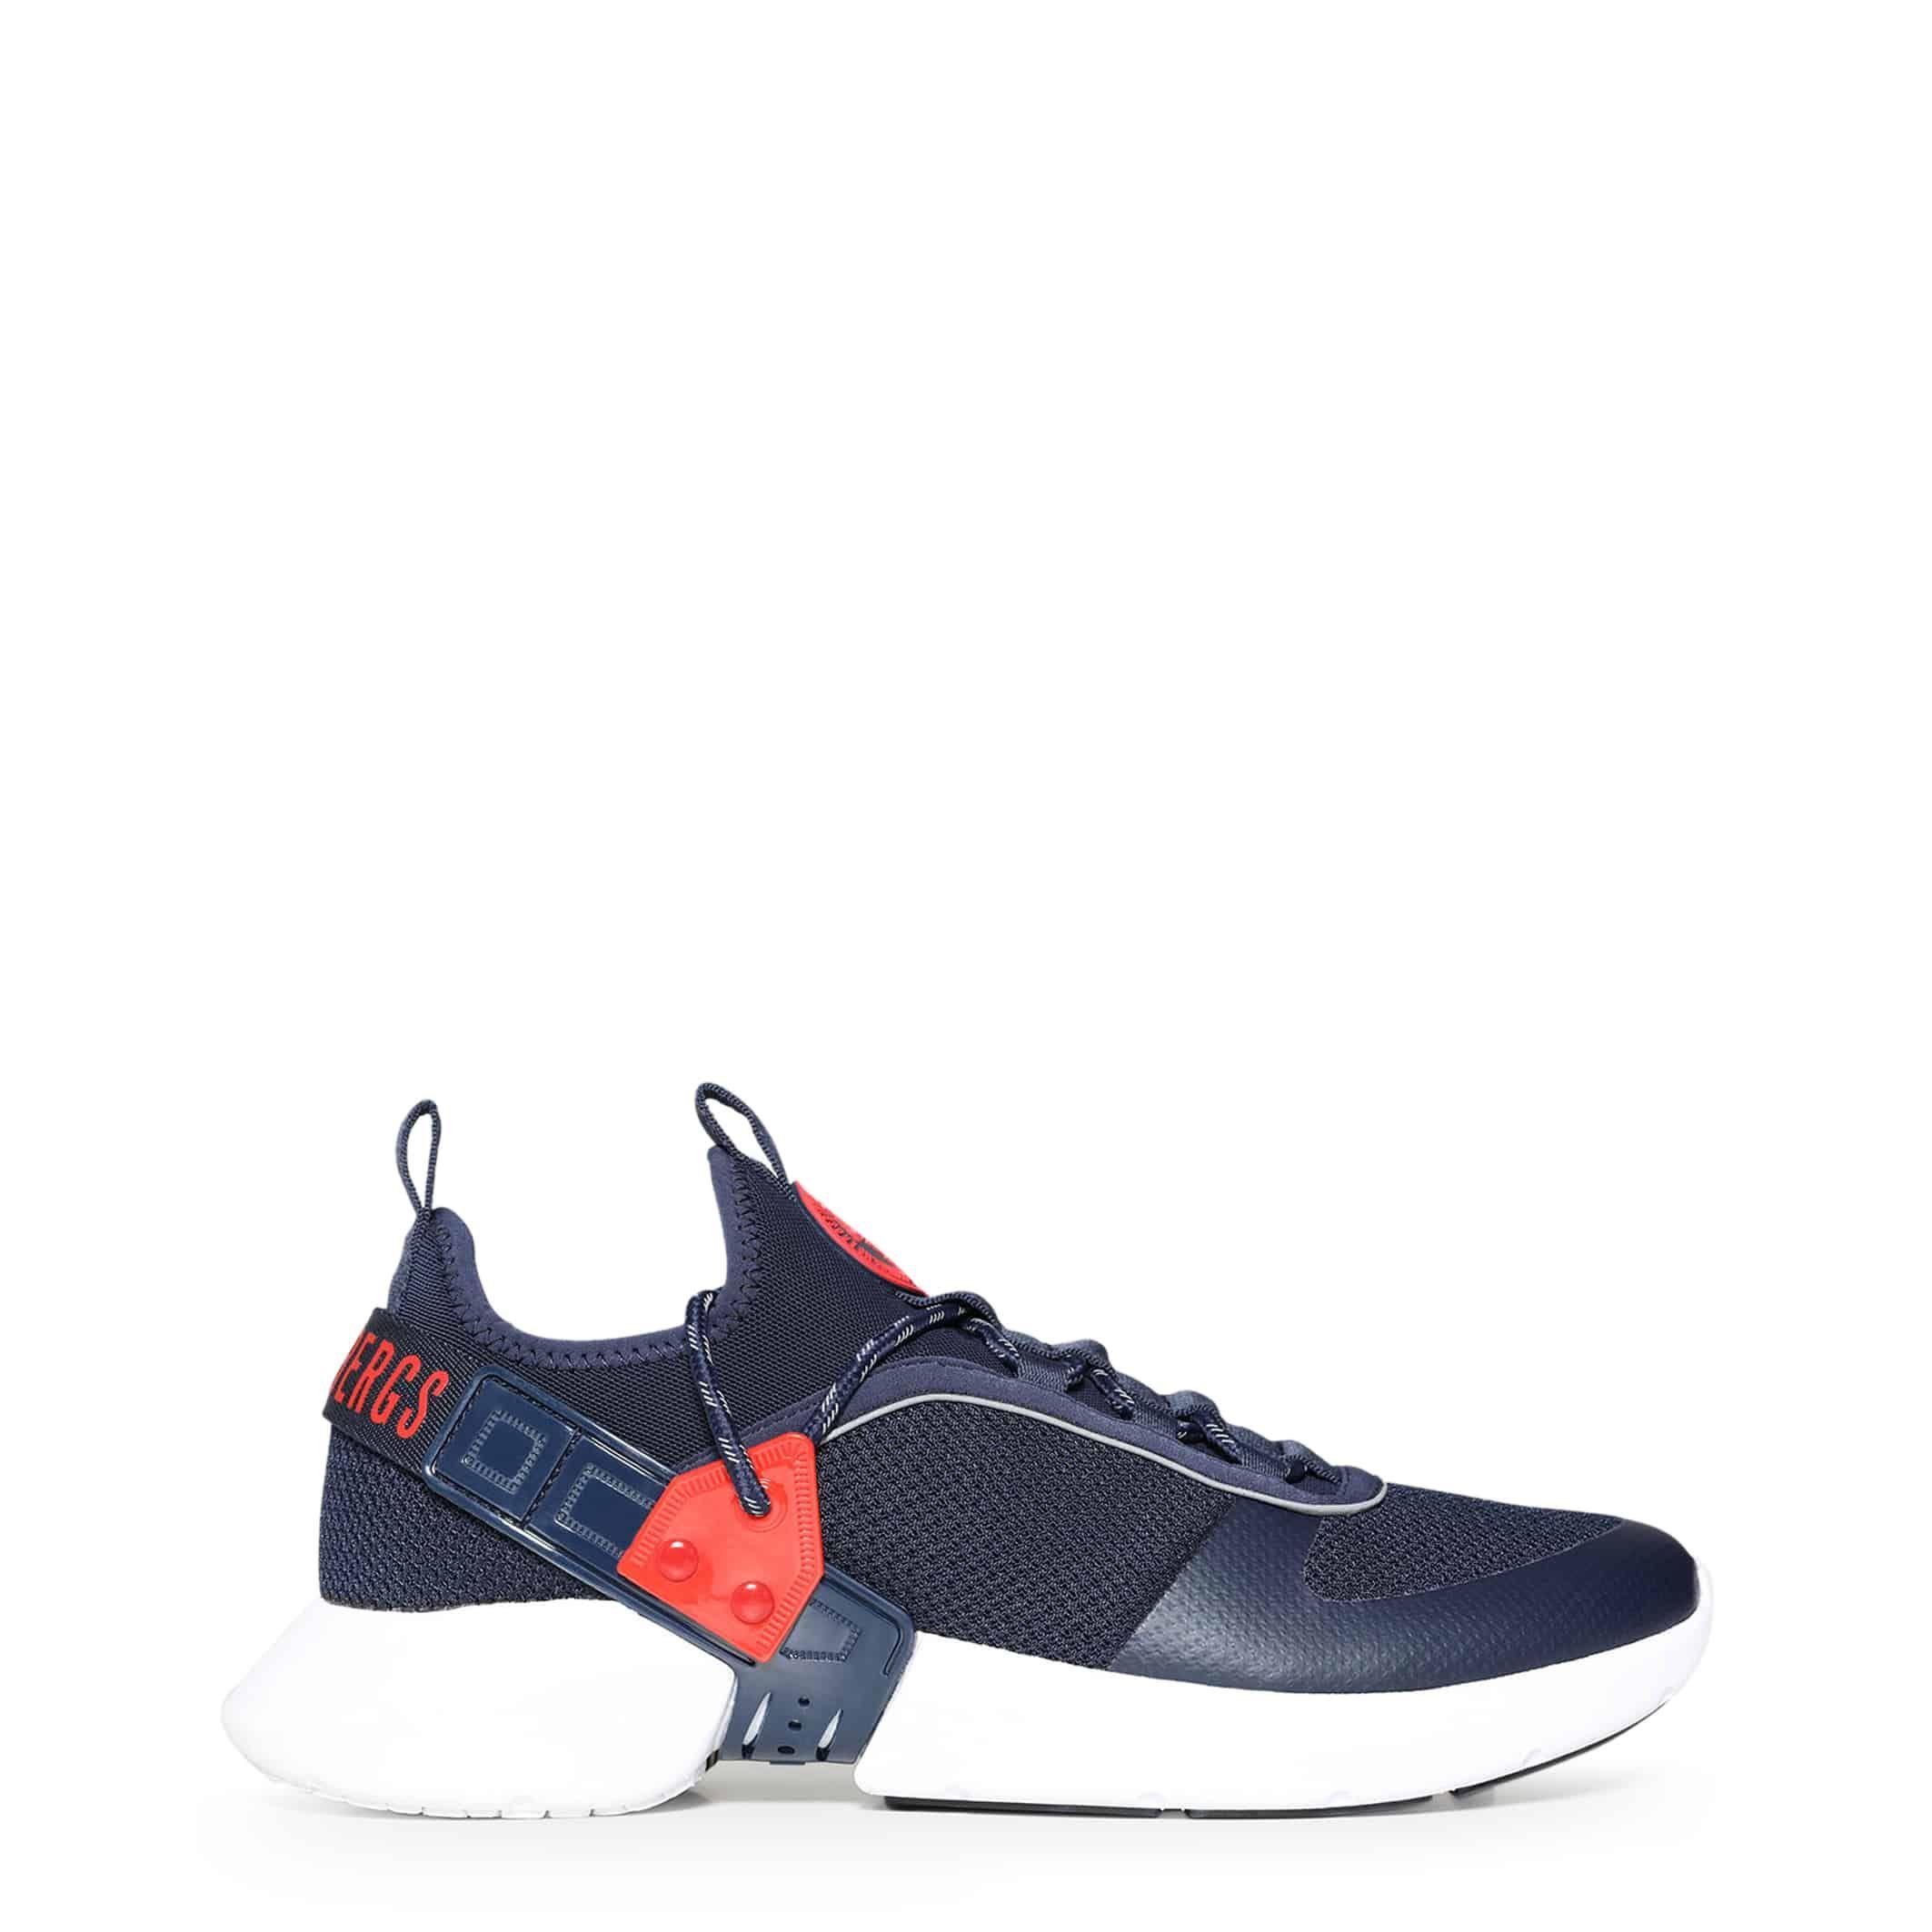 Sneakers Bikkembergs – B4BKMX19004